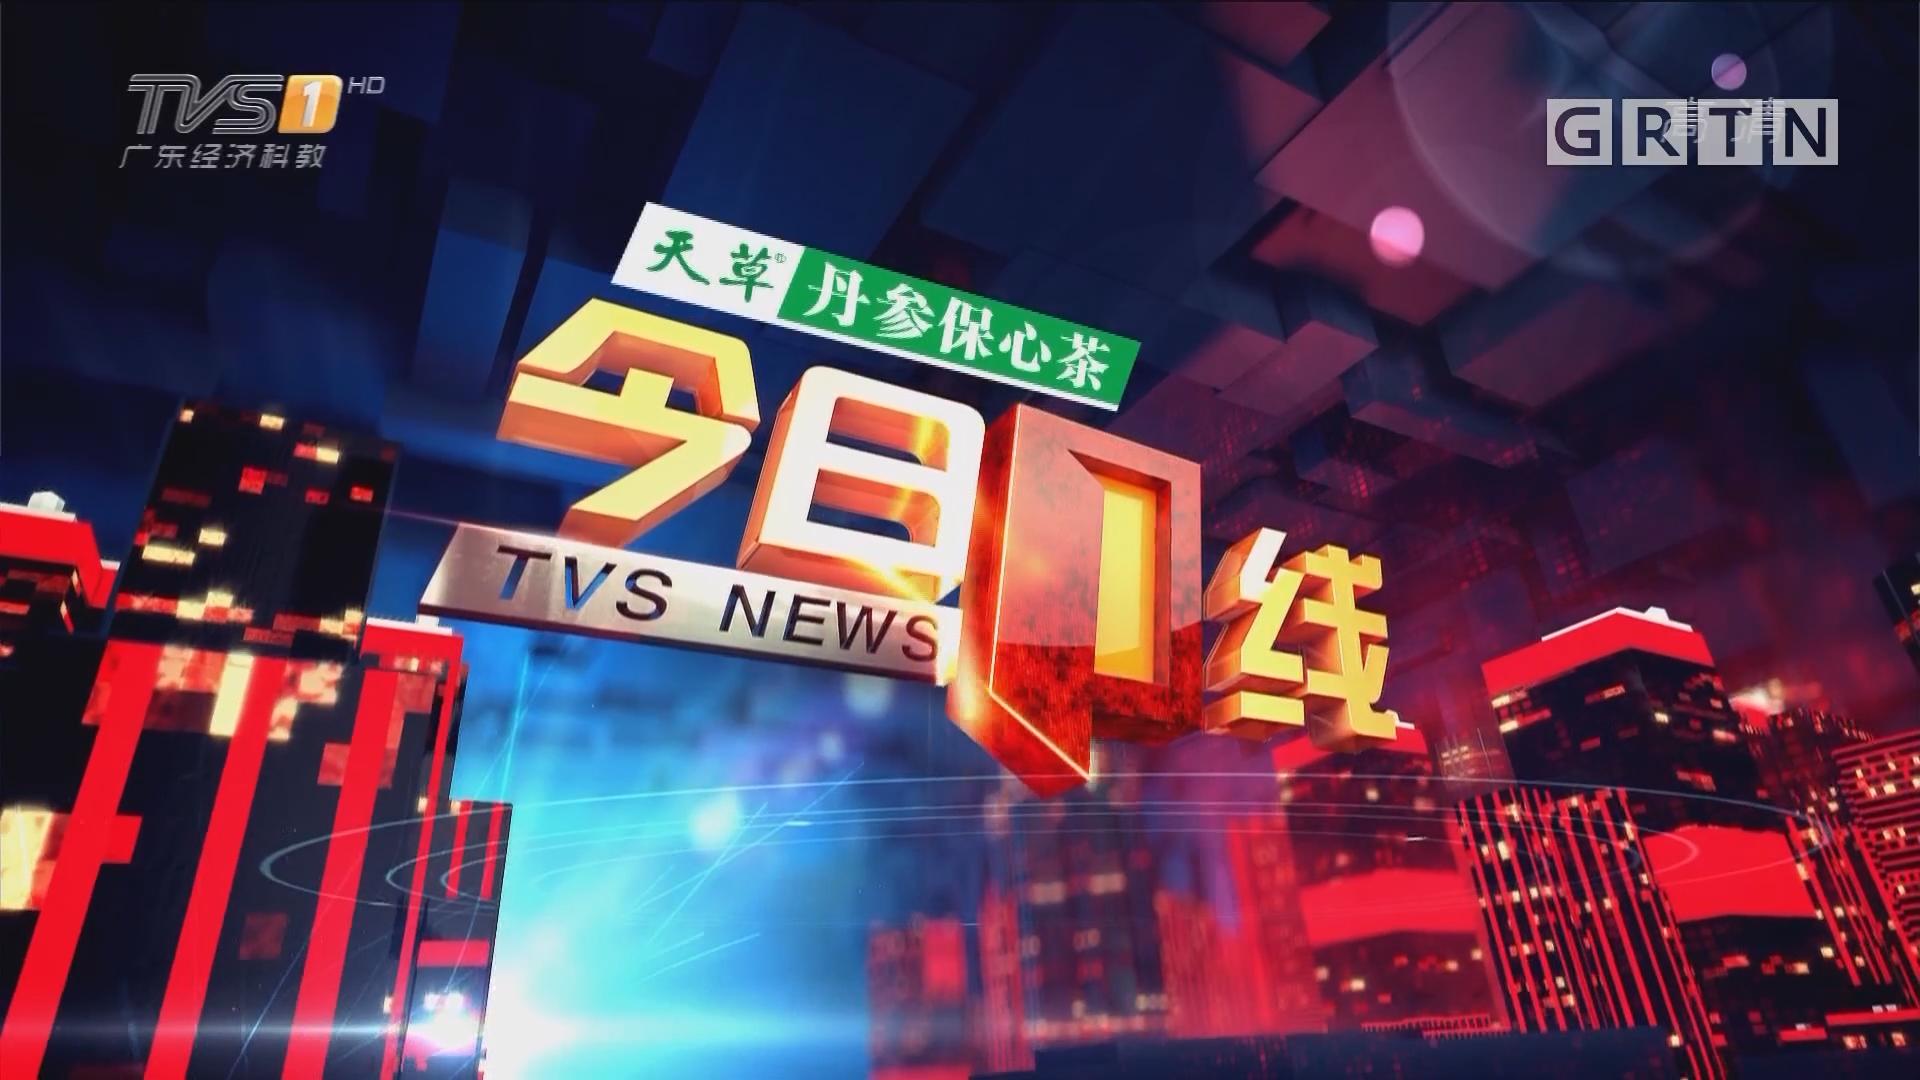 [HD][2019-02-15]今日一线:广州海珠区:失控公交冲入汽修店 被困司机获救